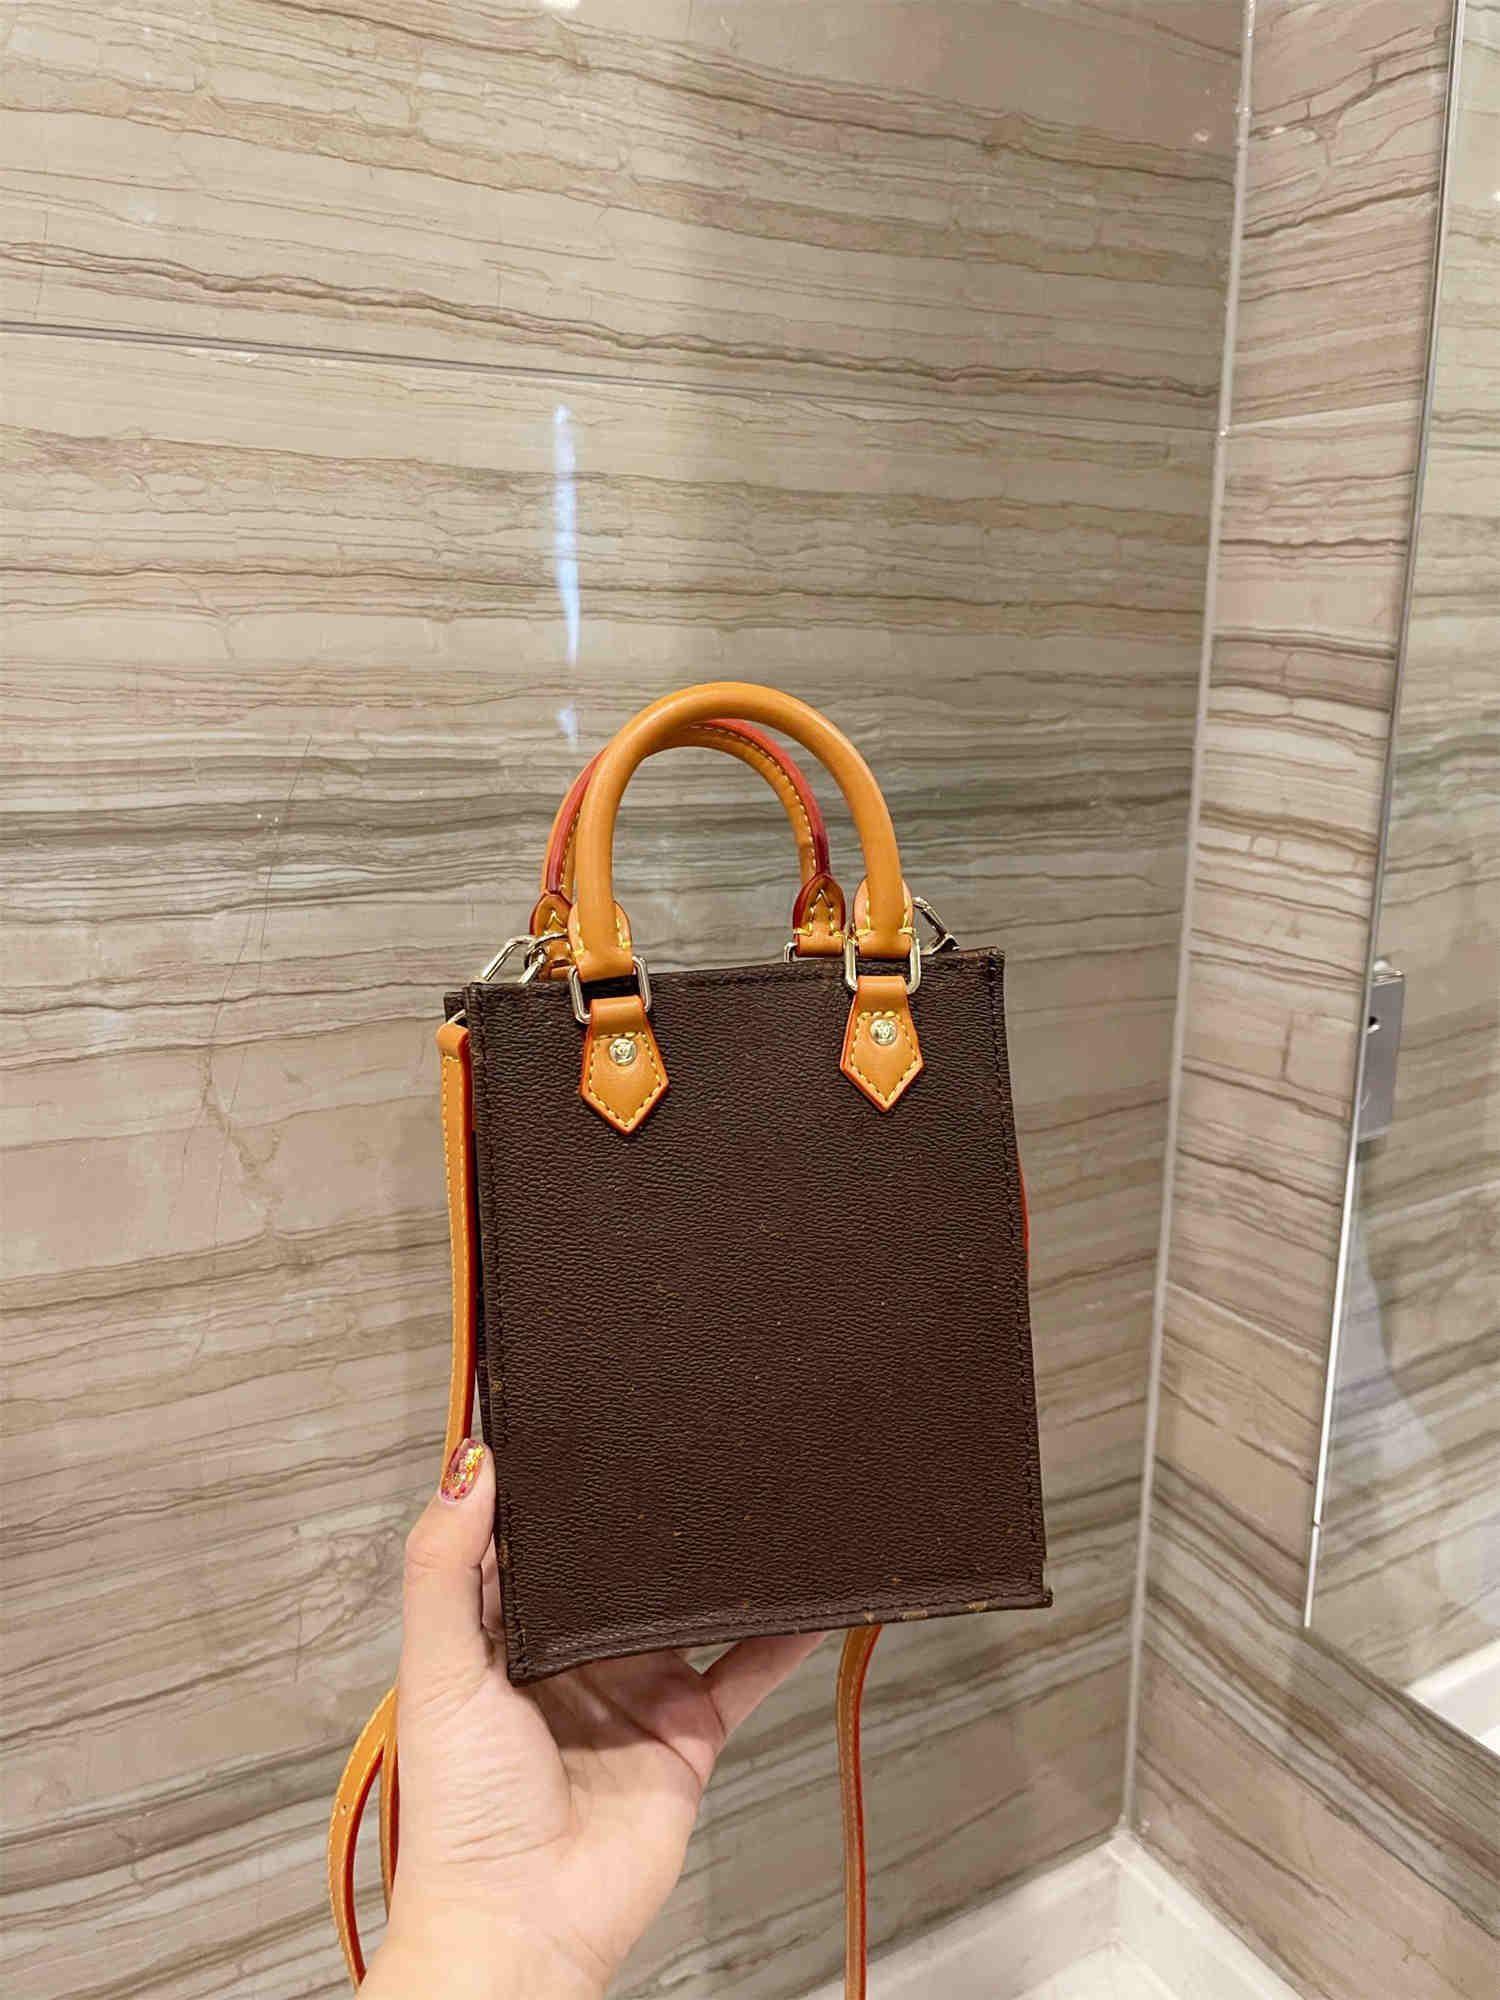 Wome luxurys мини сумки мода реальные кожаные дизайнеры цветок Tote Musics Message Messenger Crossbody сумка сумка сумки сумки кошелек рюкзак